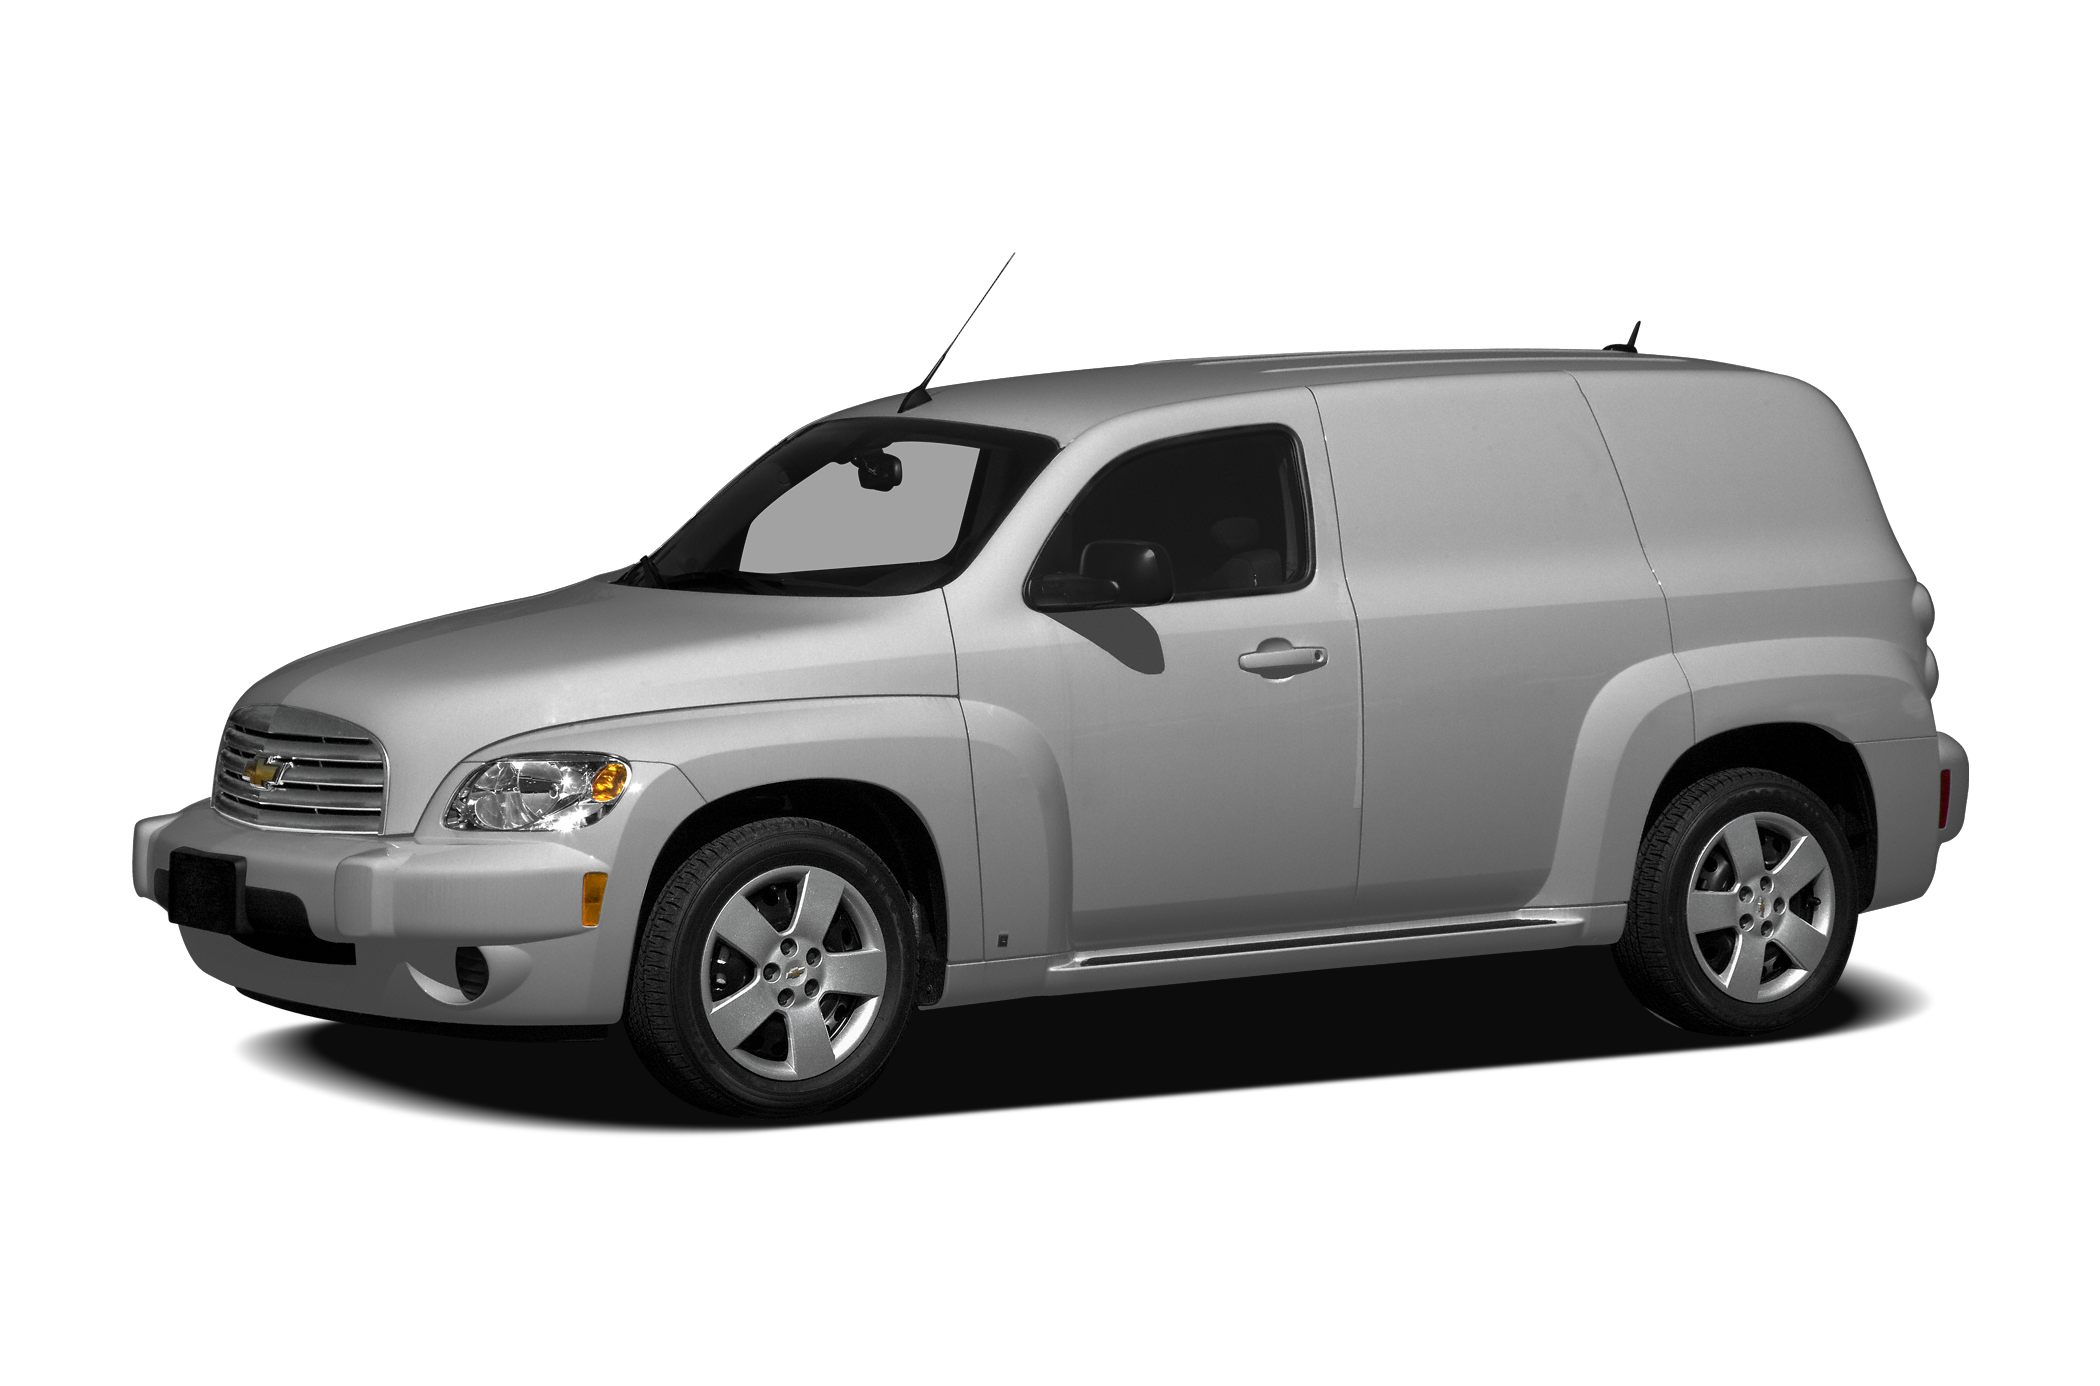 2010 Chevrolet HHR Panel